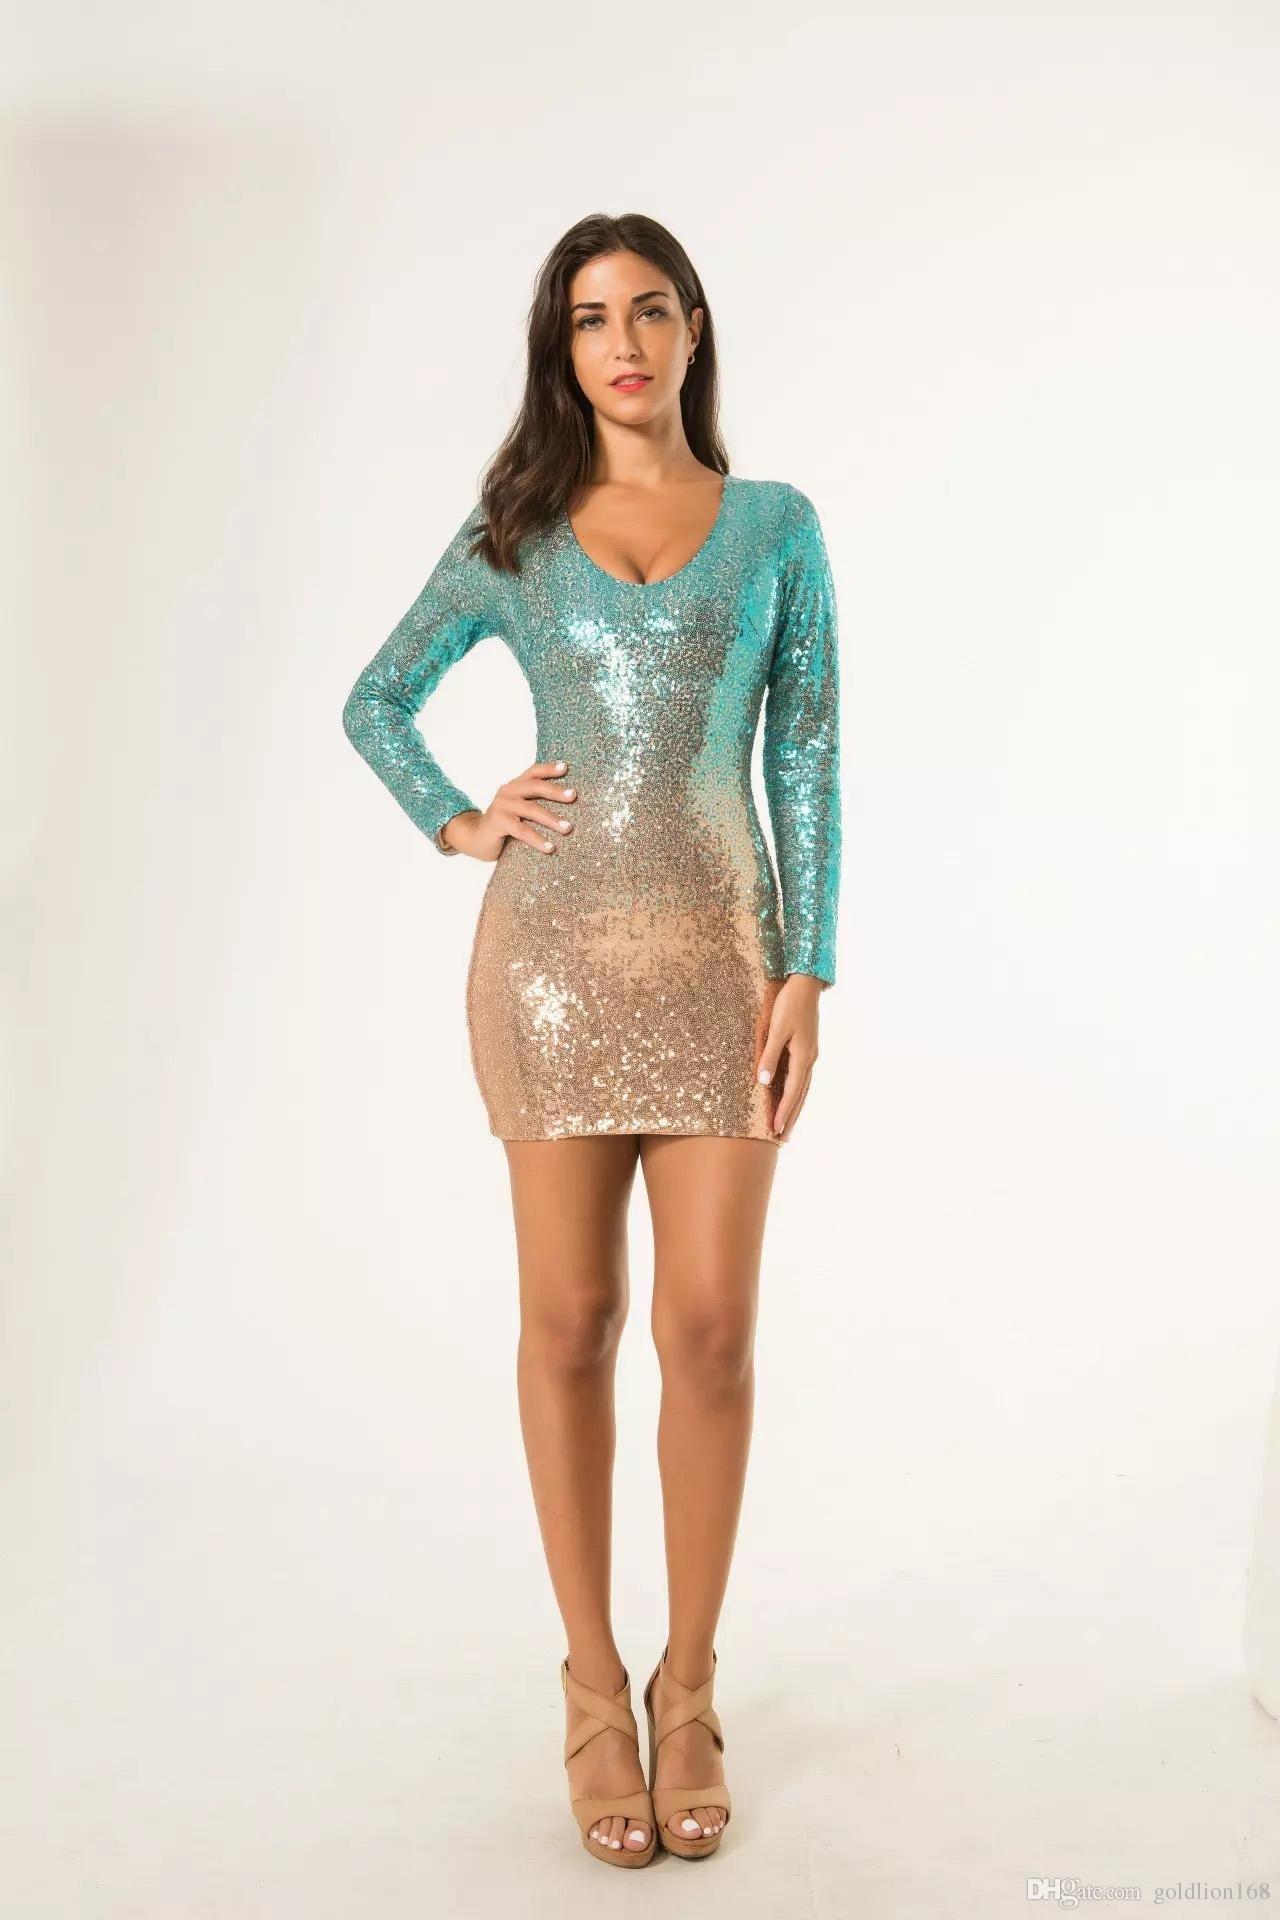 Formal Cool Schickes Kleid Winter Spezialgebiet13 Fantastisch Schickes Kleid Winter Bester Preis